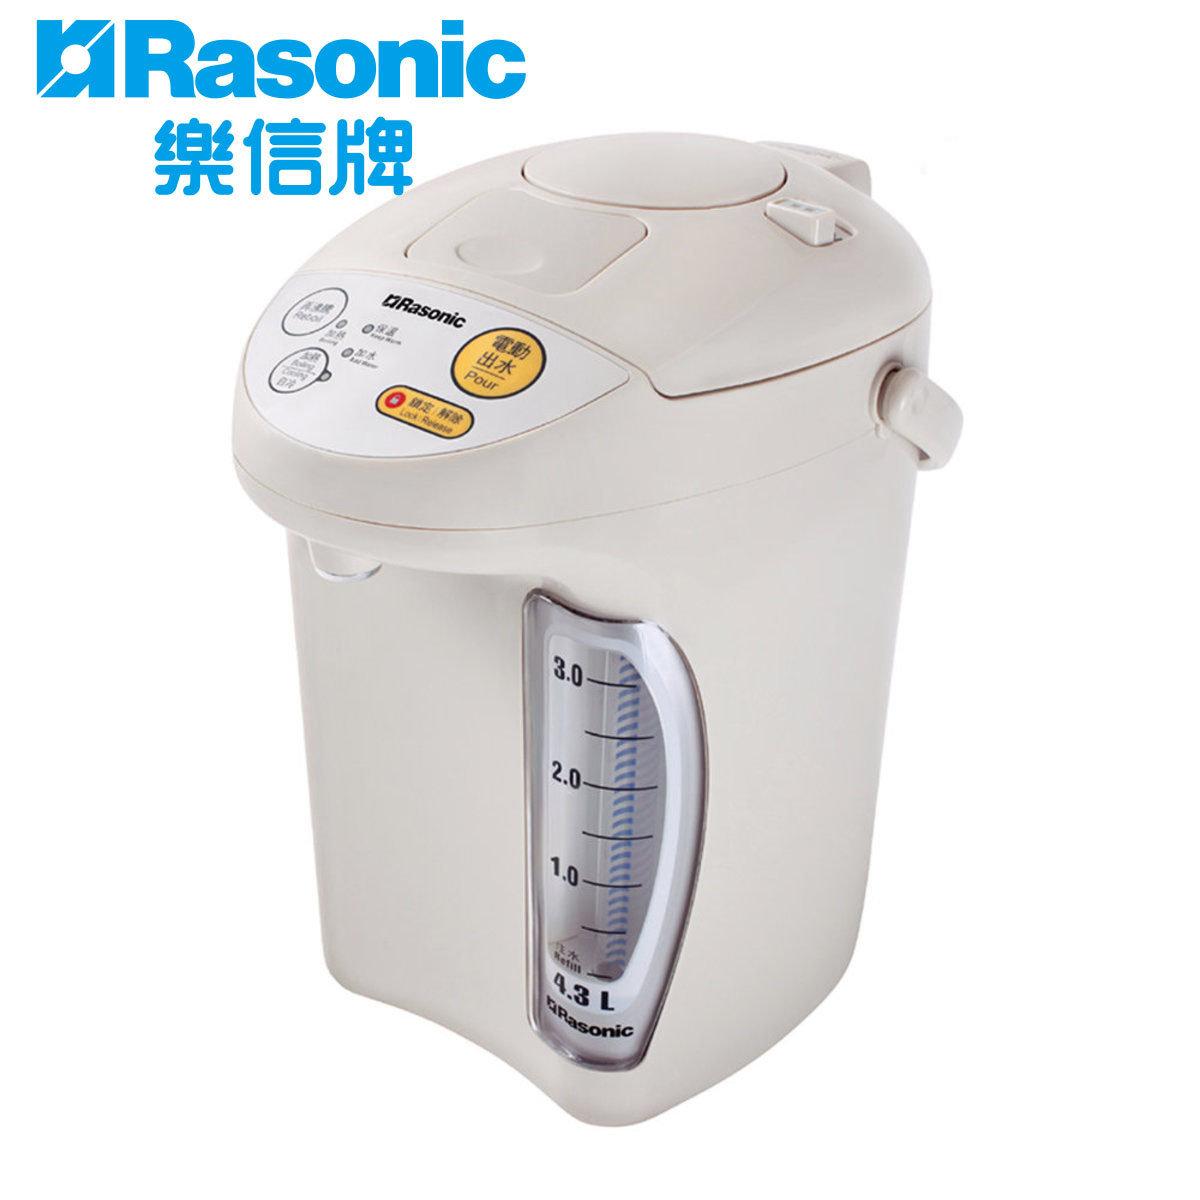 Electric Pump, Cup Push Dispenser or Air Pressure Thermo Pot (4.3L) - RTP-W43S